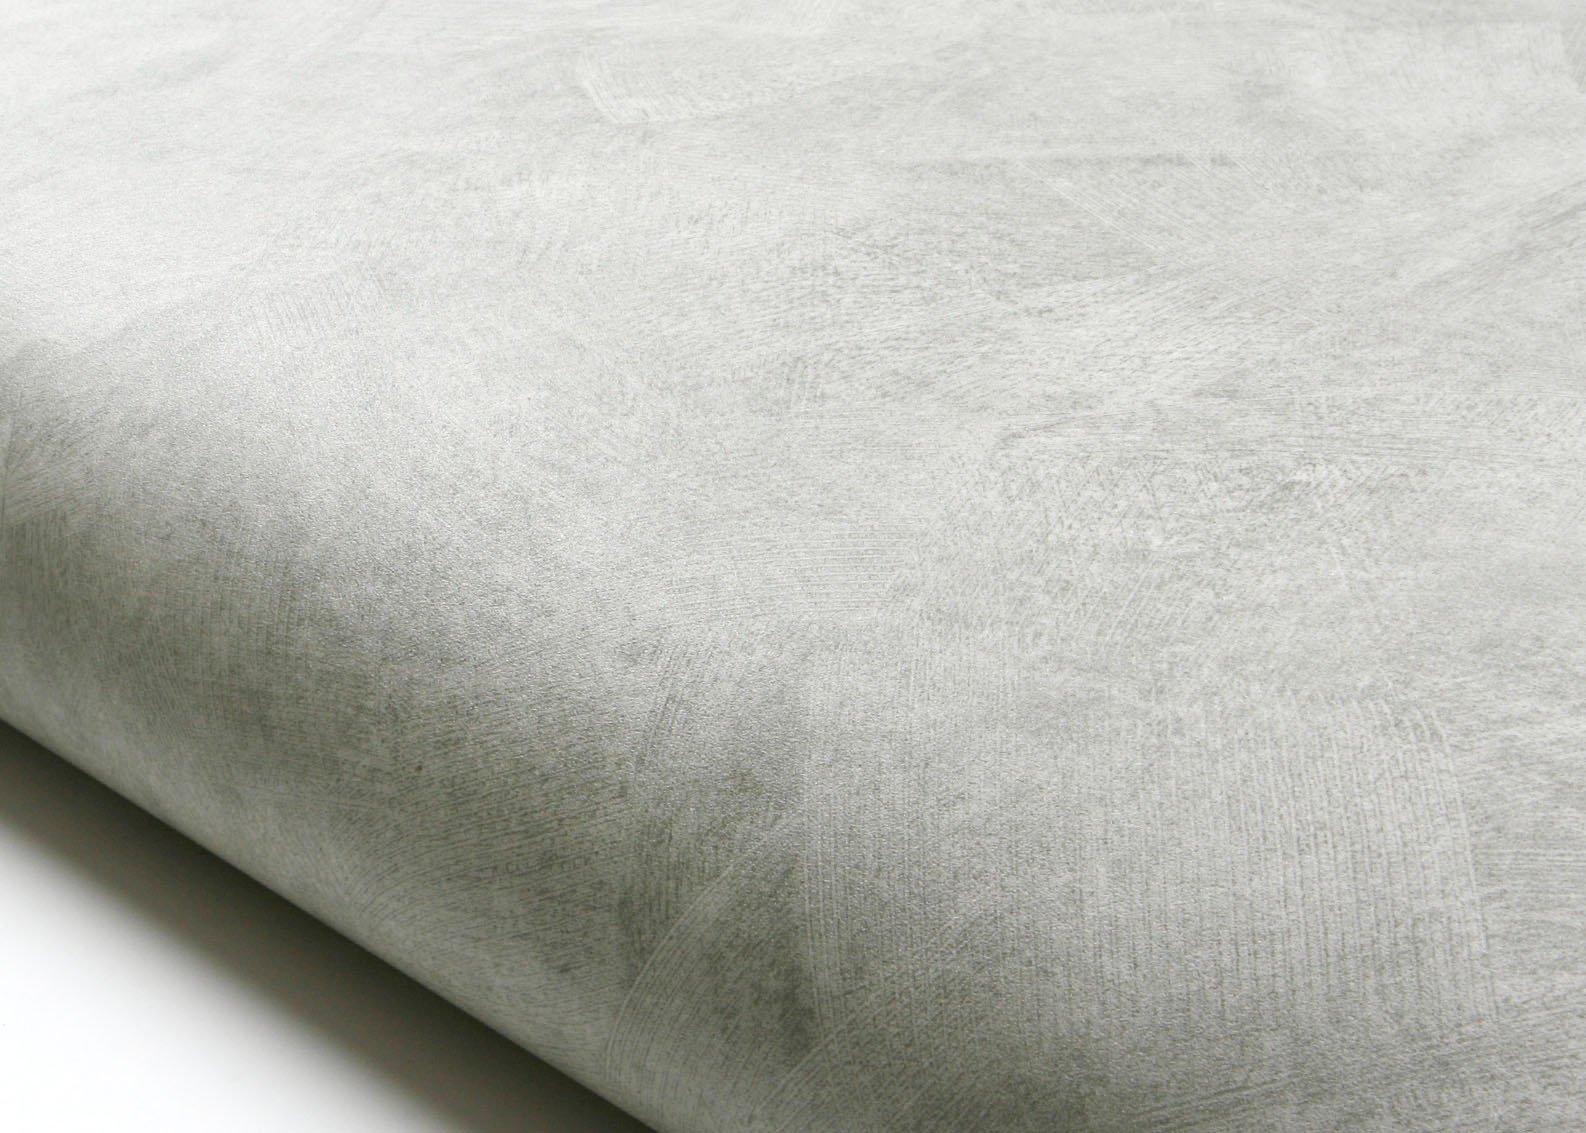 ROSEROSA Peel & Stick Backsplash Slate Stone Concrete Rust Brick Textured Vinyl Contact Paper Self-Adhesive Wallpaper Shelf Liner Table and Door Reform (FDM1702 : 2.00 Feet X 6.56 Feet)